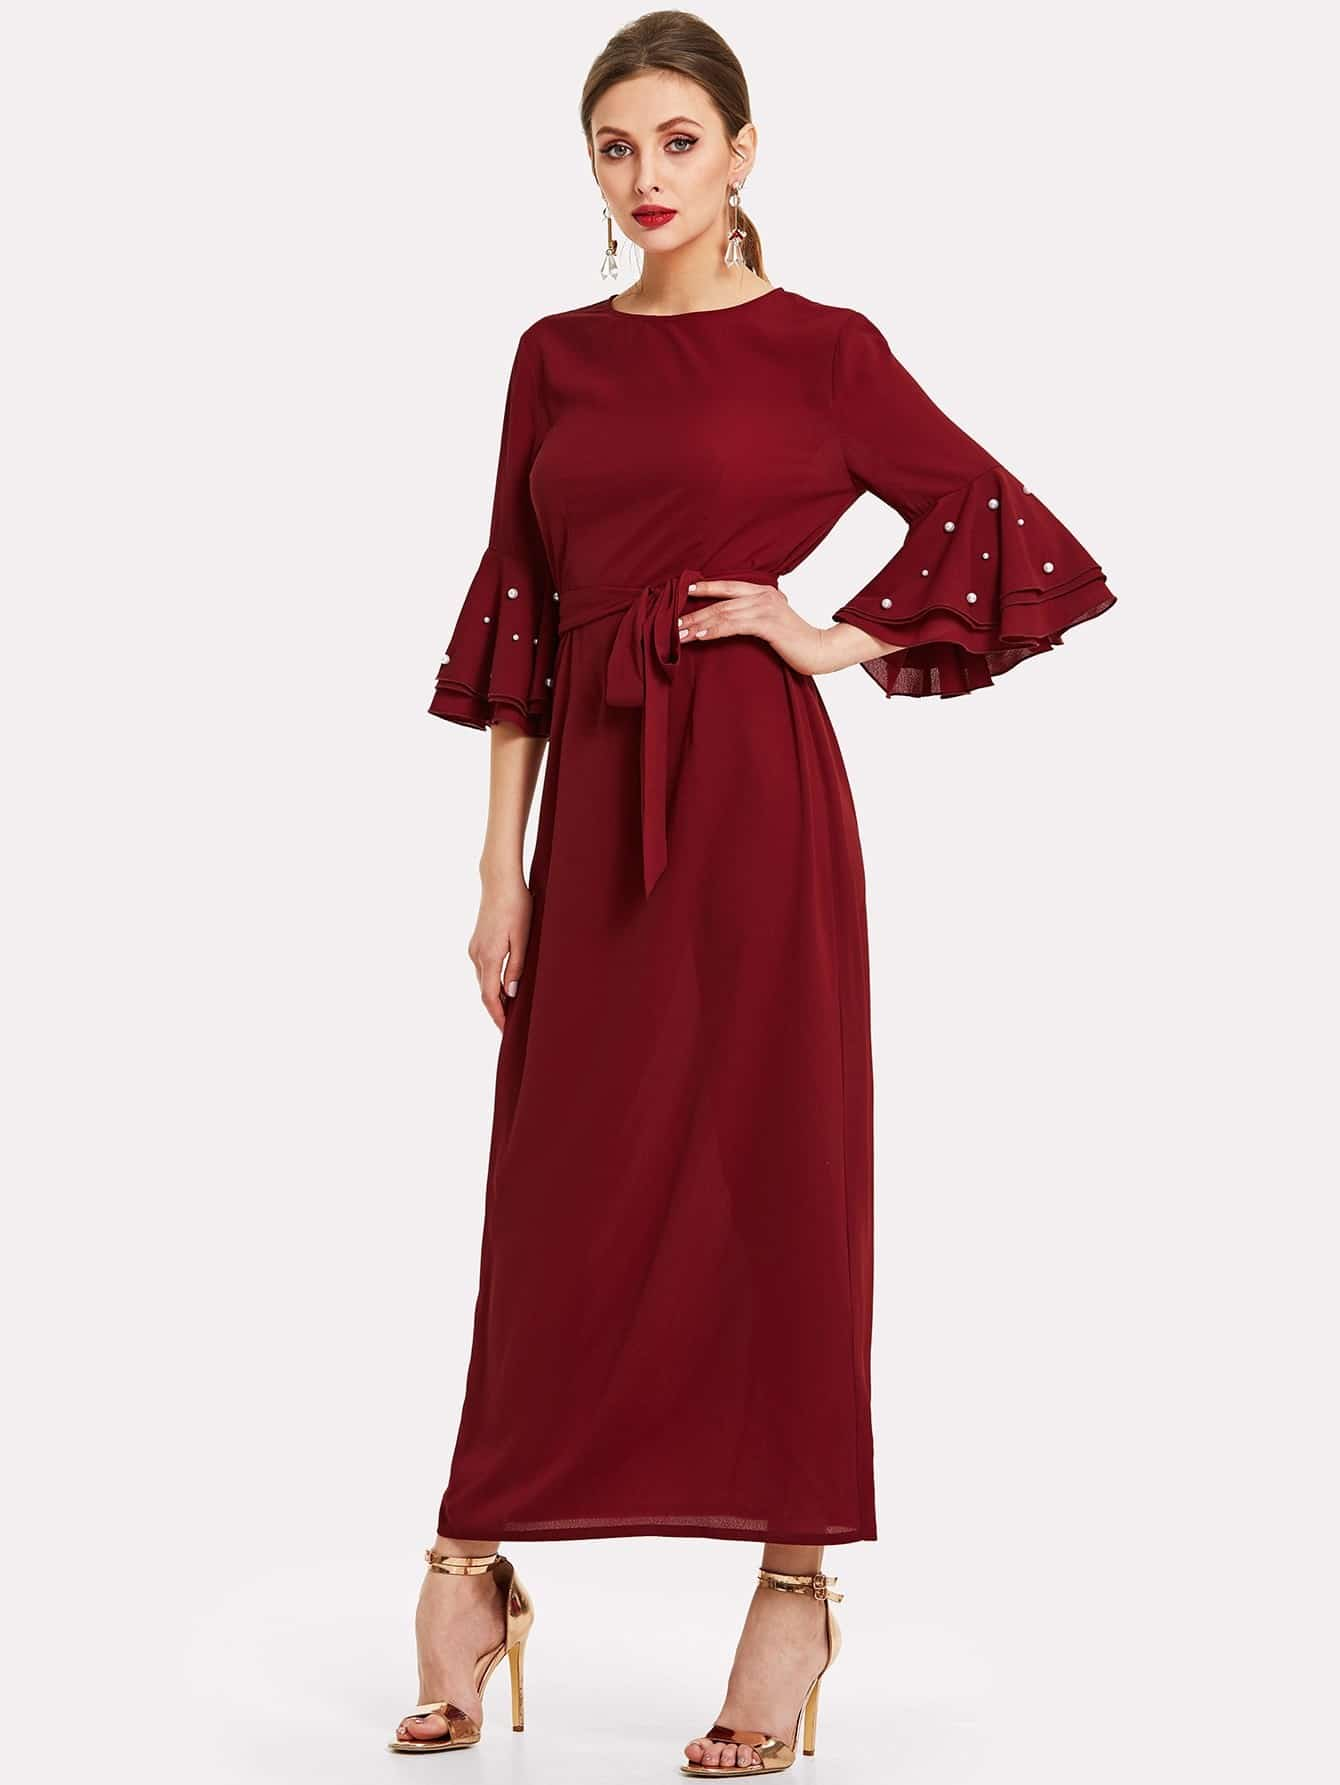 Pearl Beading Layered Ruffle Hijab Evening Dress pearl beading layered fringe detail dress